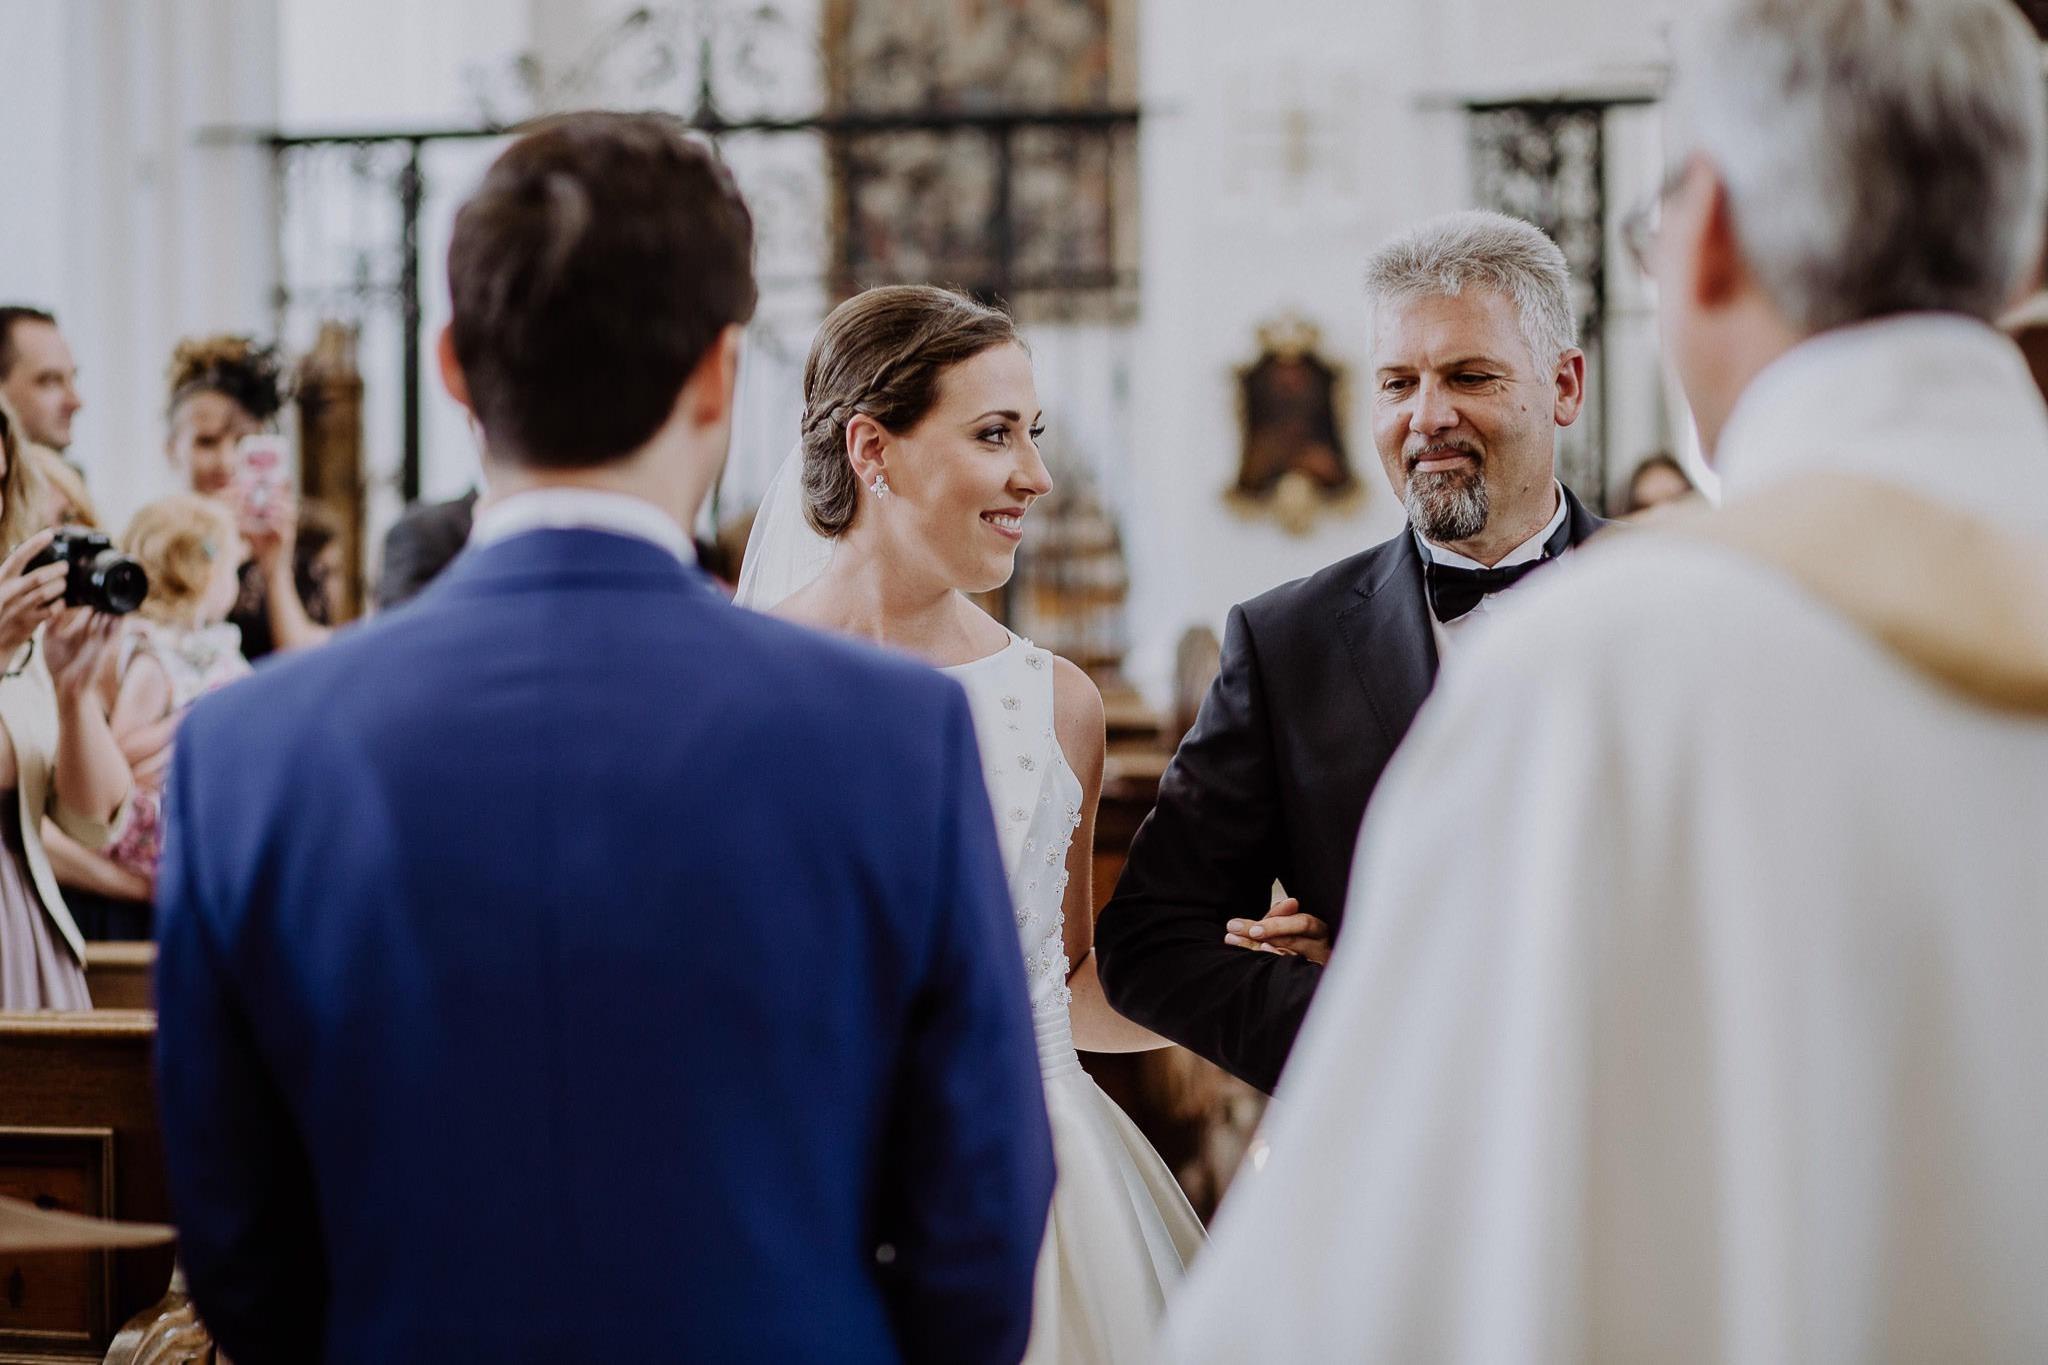 wedding photographer hamilton new zealand 1033 2